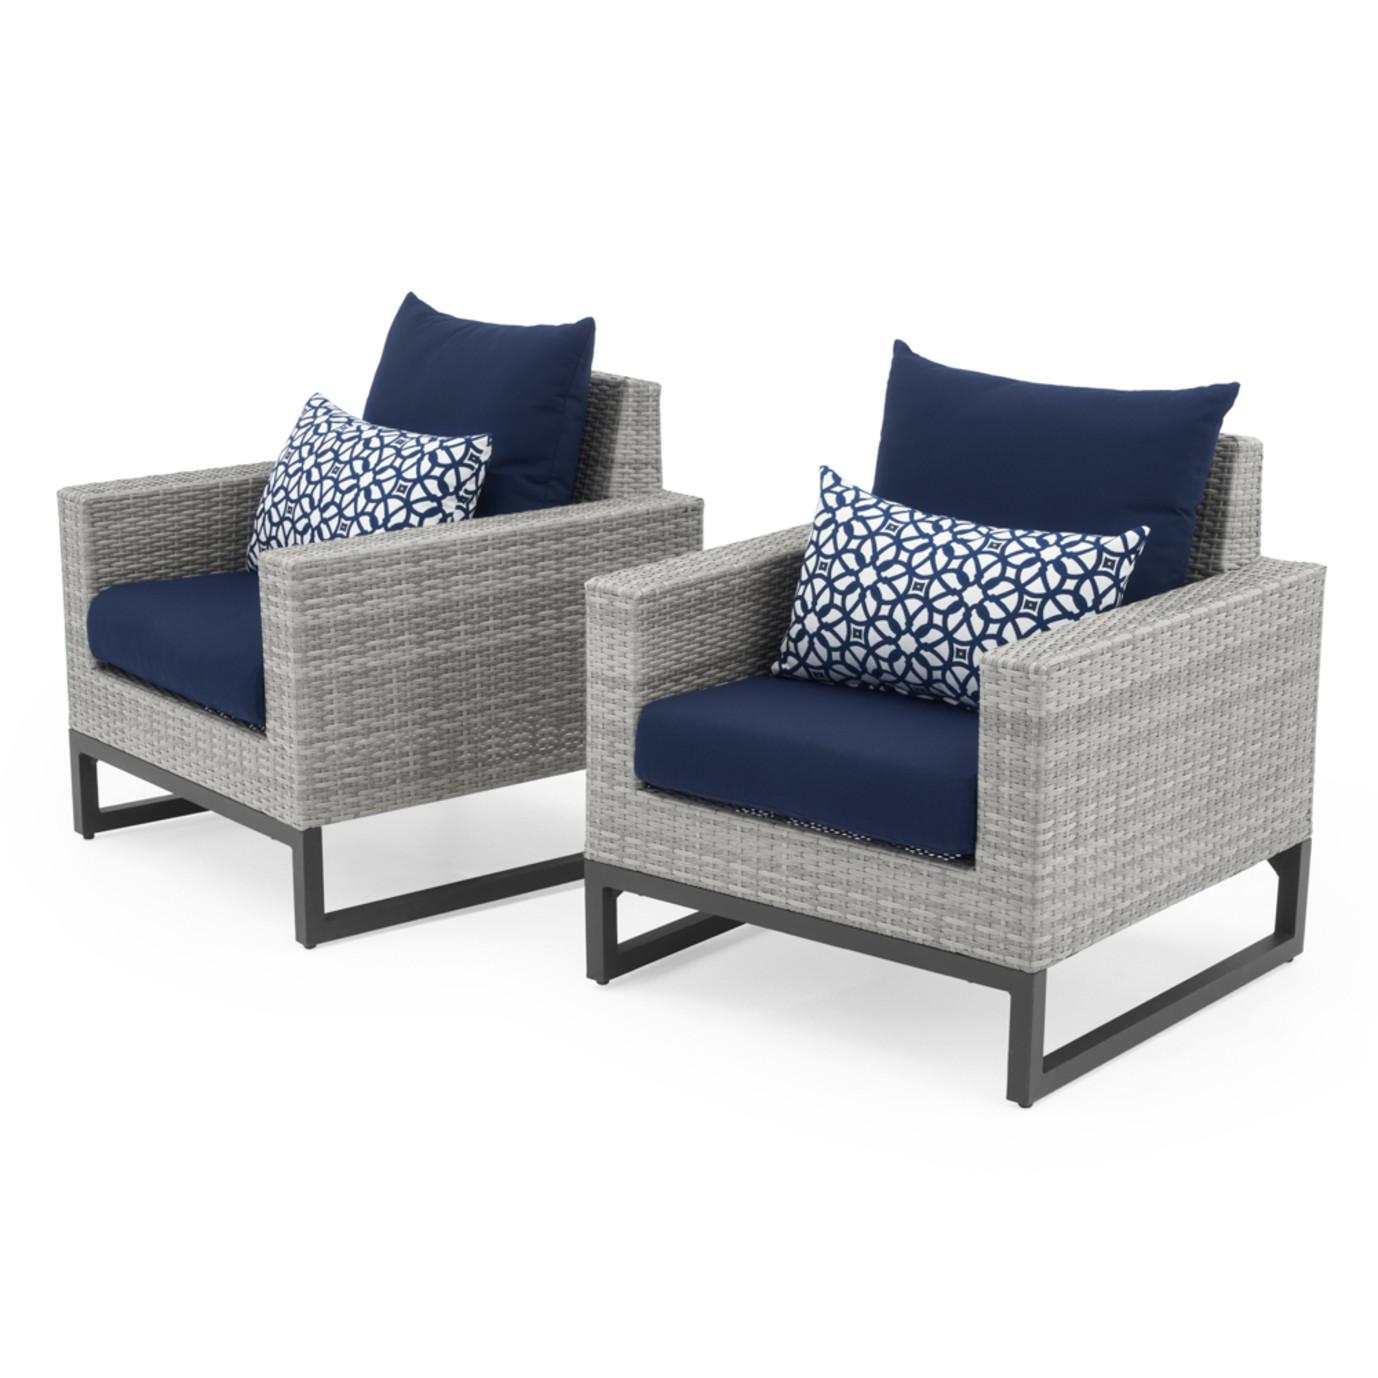 Milo™ Gray Club Chairs - Navy Blue